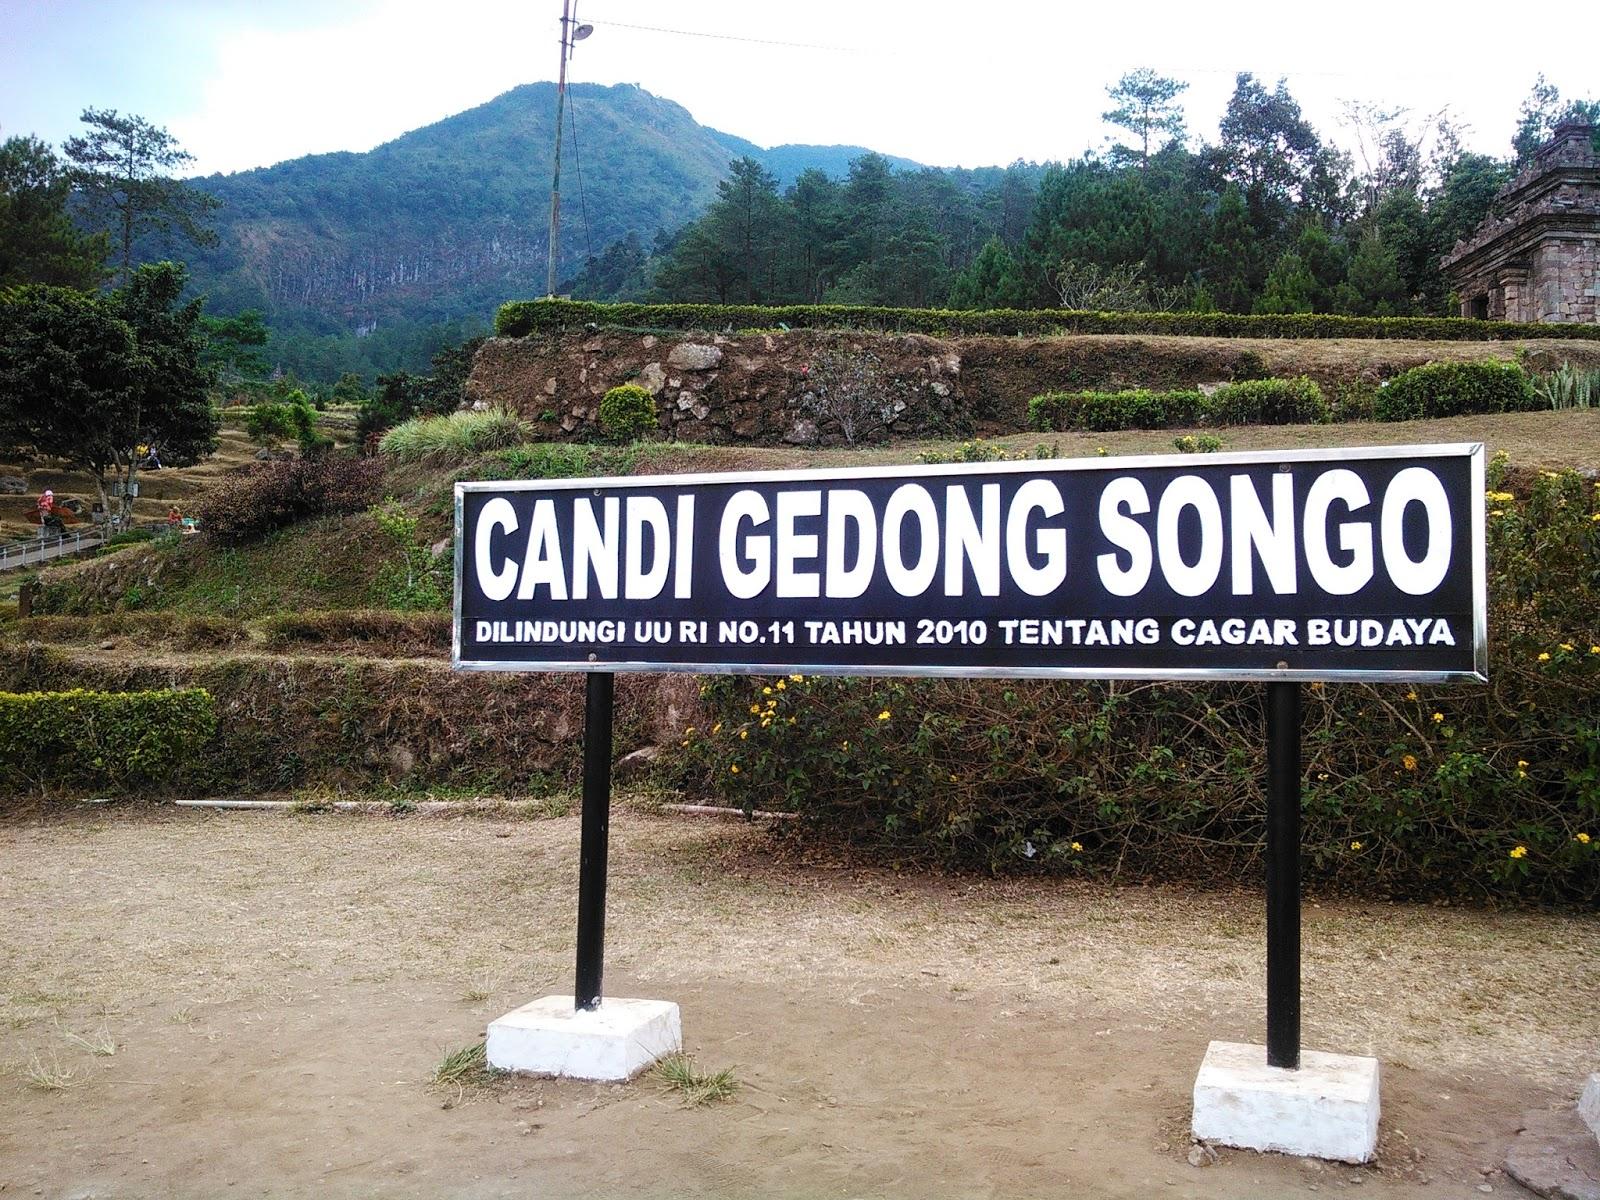 Candi Gedong Songo Bandungan Semarang Travelling Indonesia Berada Lereng Gunung